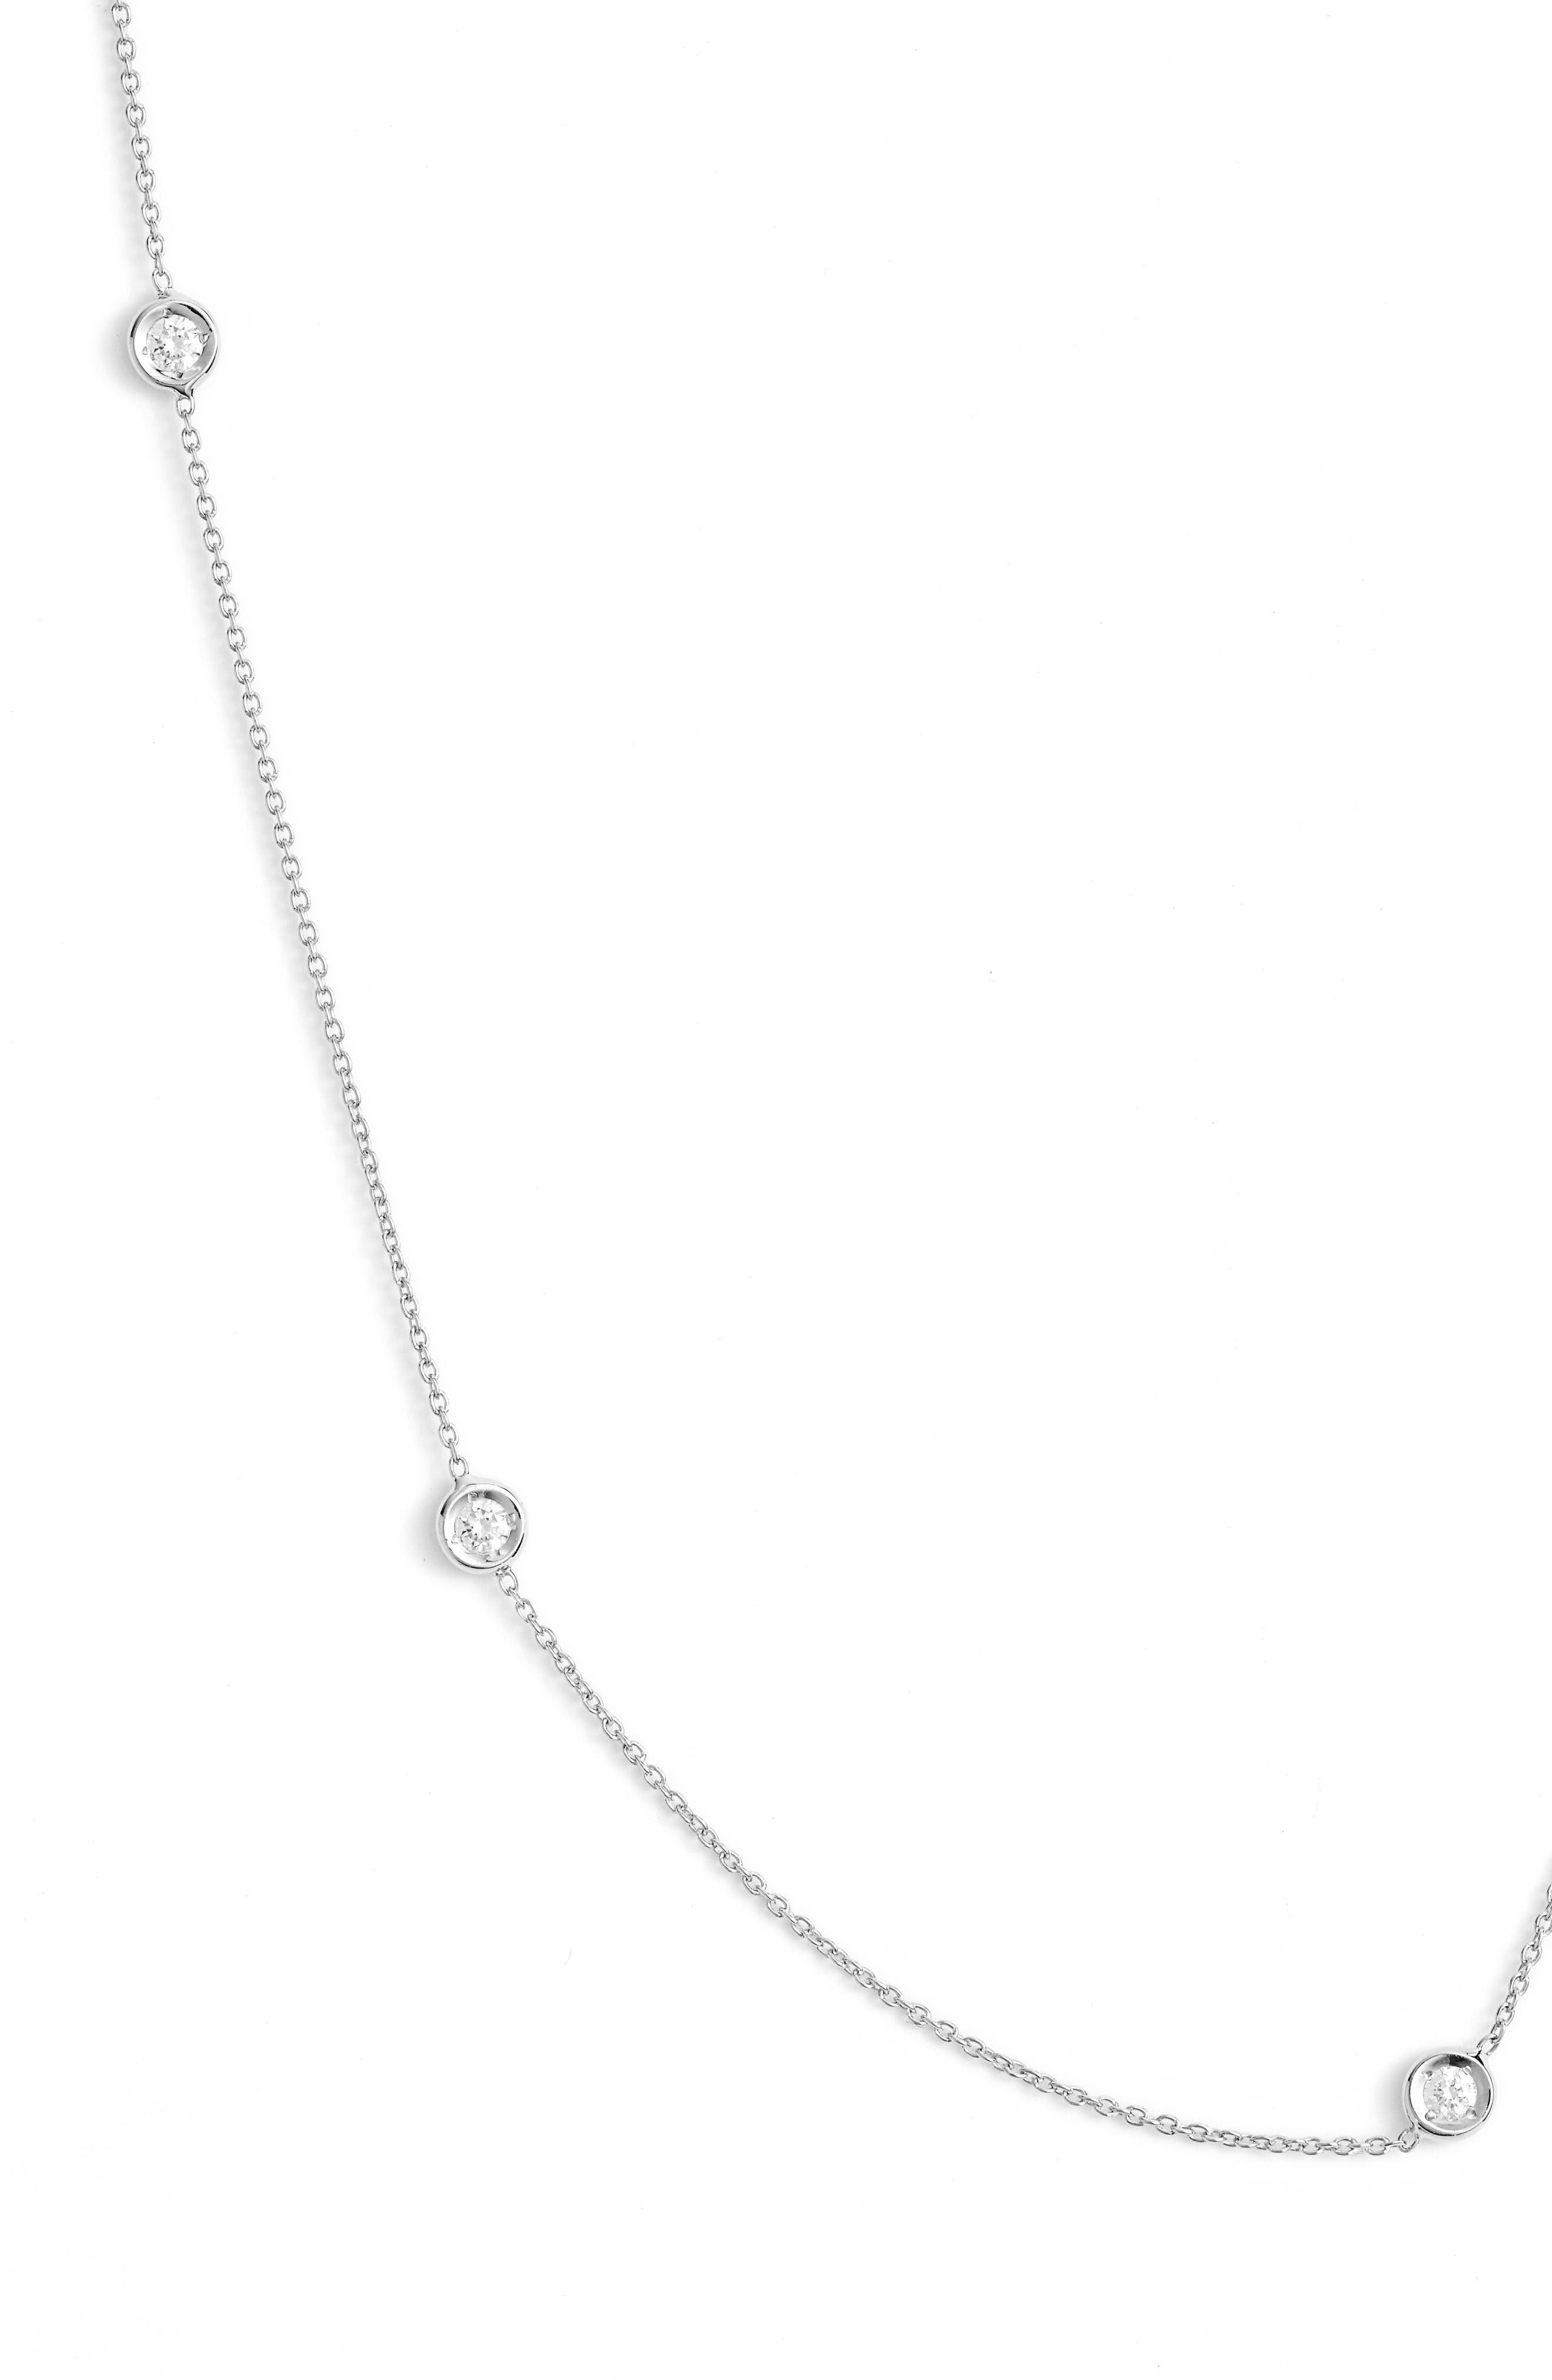 Diamond Station Necklace,                             Alternate thumbnail 2, color,                             D0.23 GHSI 18KWG